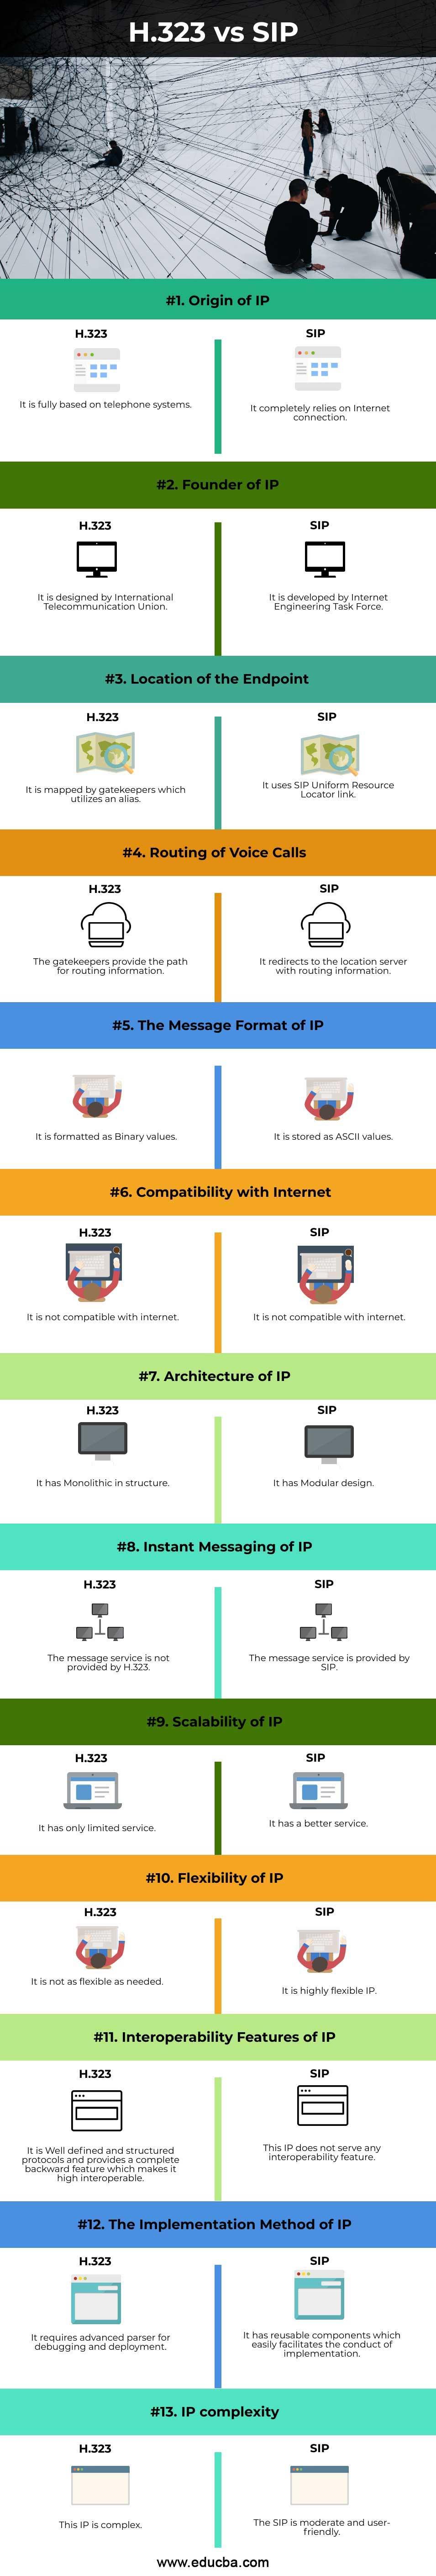 H 323 vs SIP-info